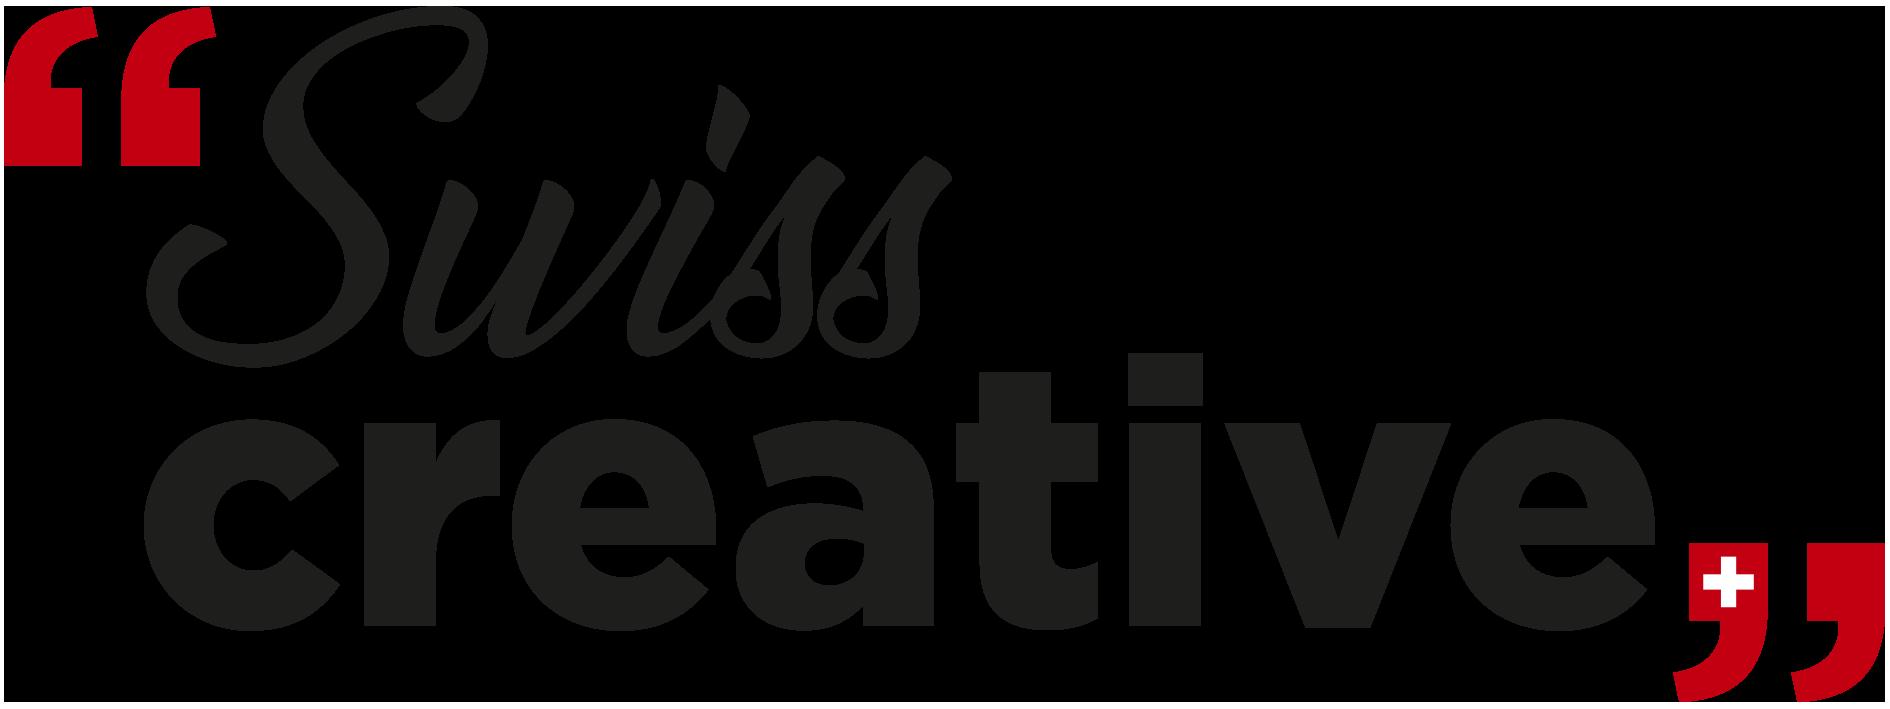 Swiss Creative